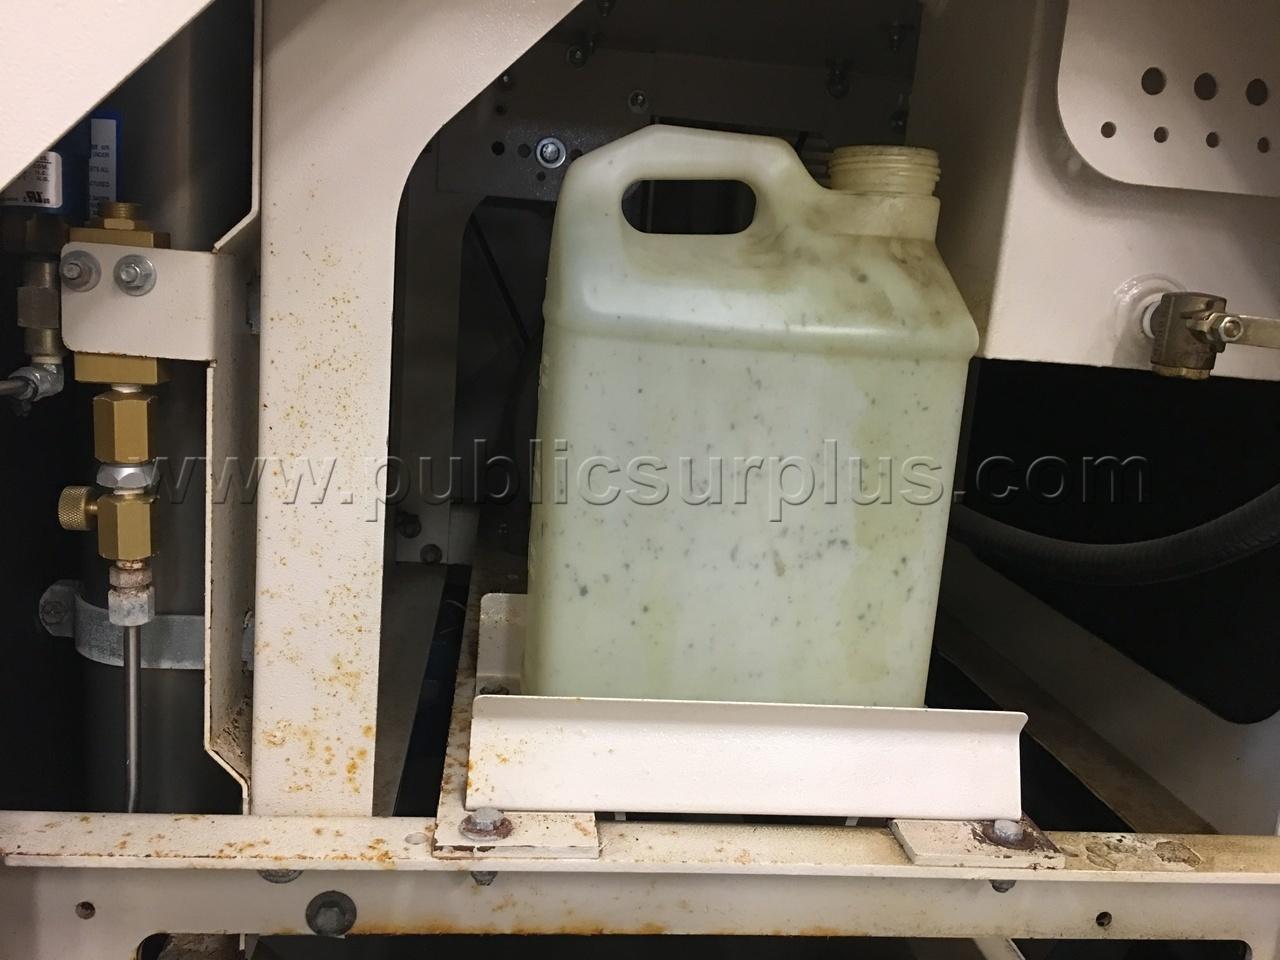 #2303883 - Bauer Compressor, Unicus III, SCBA Refill Station, QTY: 1